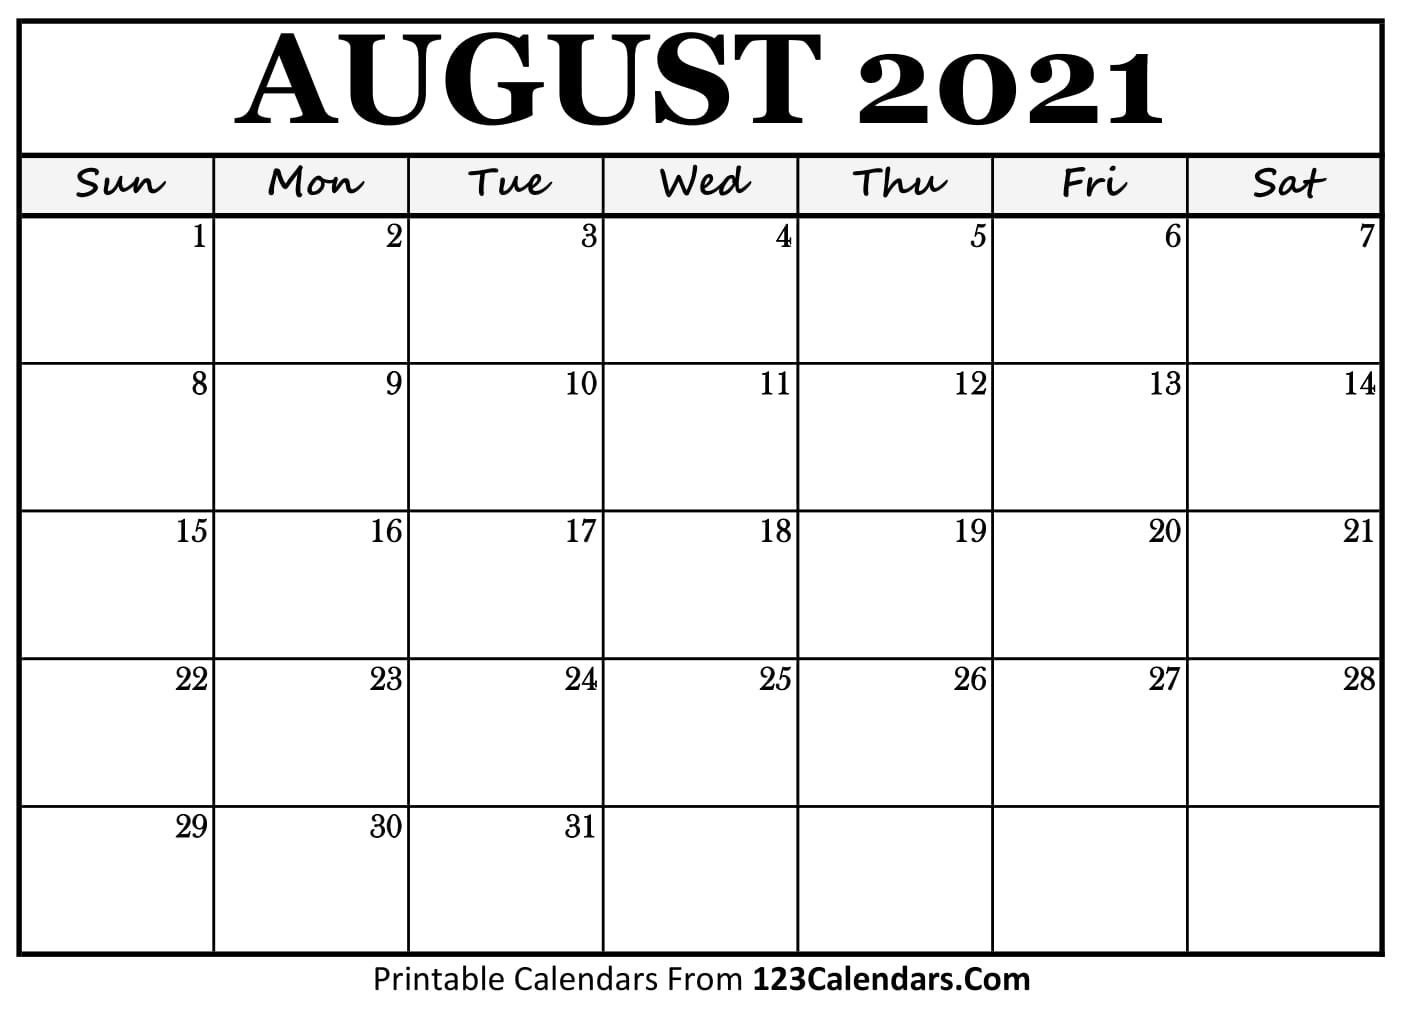 Printable August 2021 Calendar Templates | 123Calendars with regard to August 2021 Template Calendar